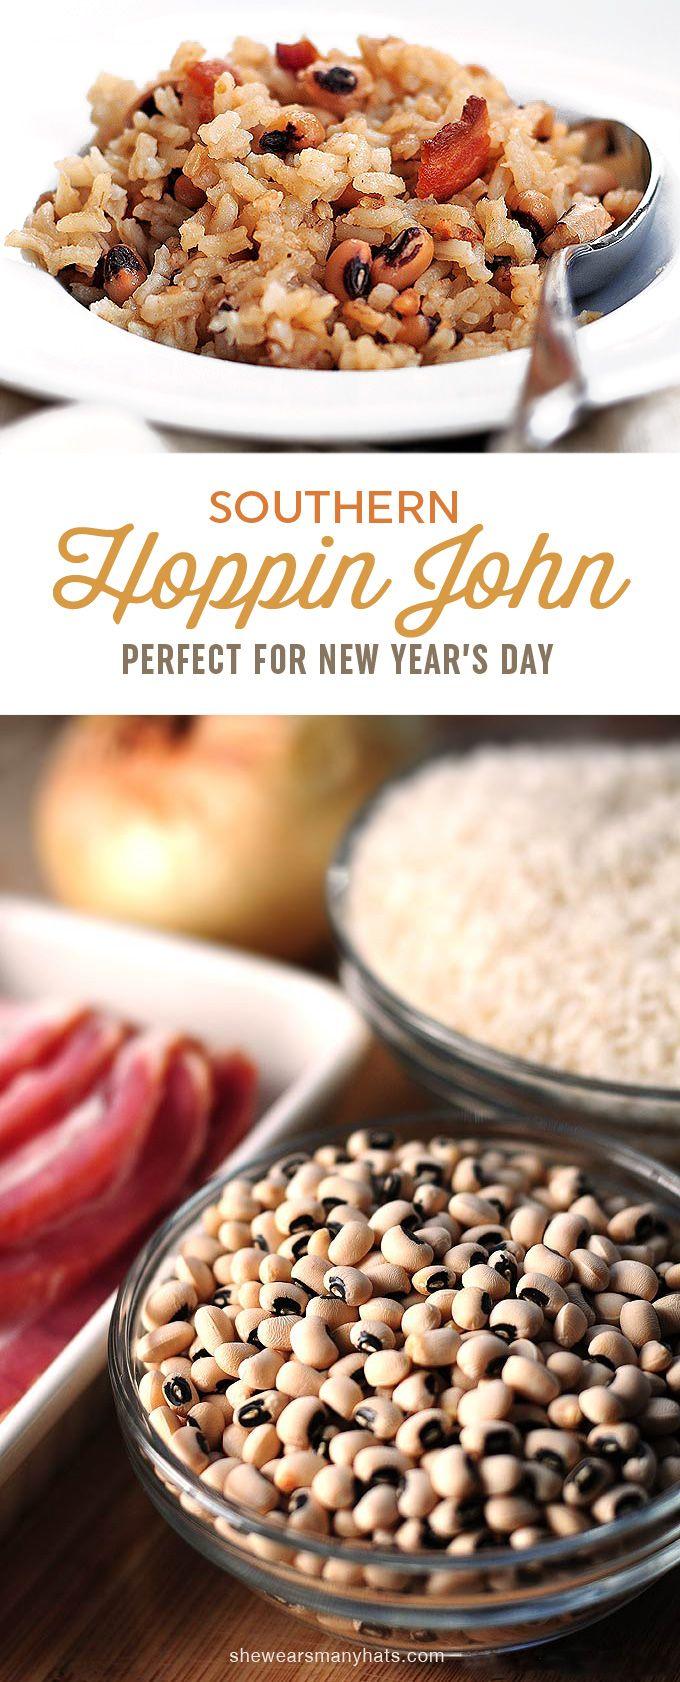 Hoppin John, a traditional southern dish enjoyed each year